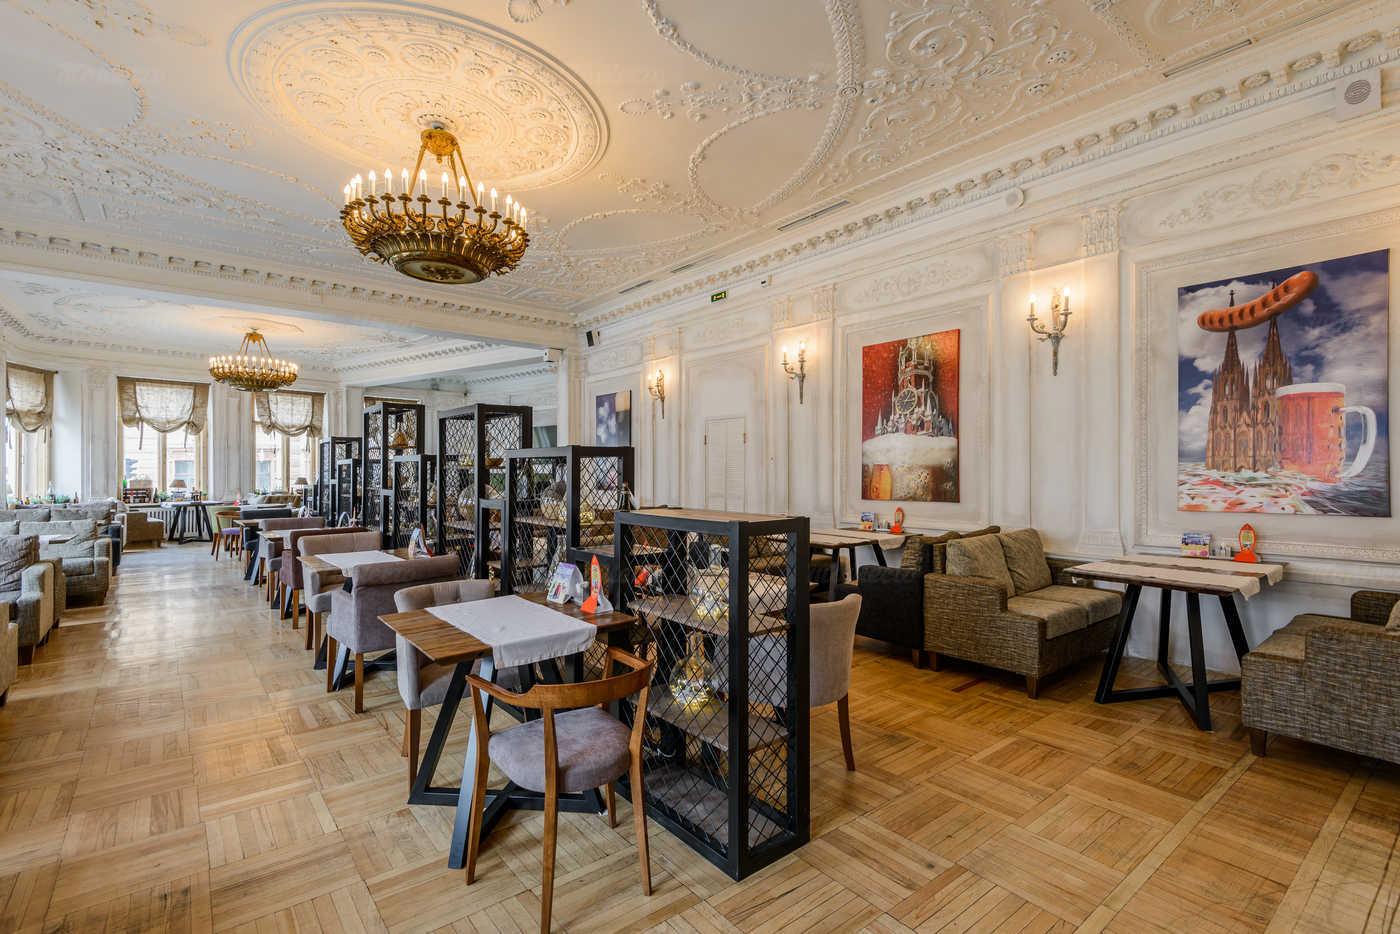 Ресторан Шато Винтаж (Chateau Vintage) на Невском проспекте фото 10